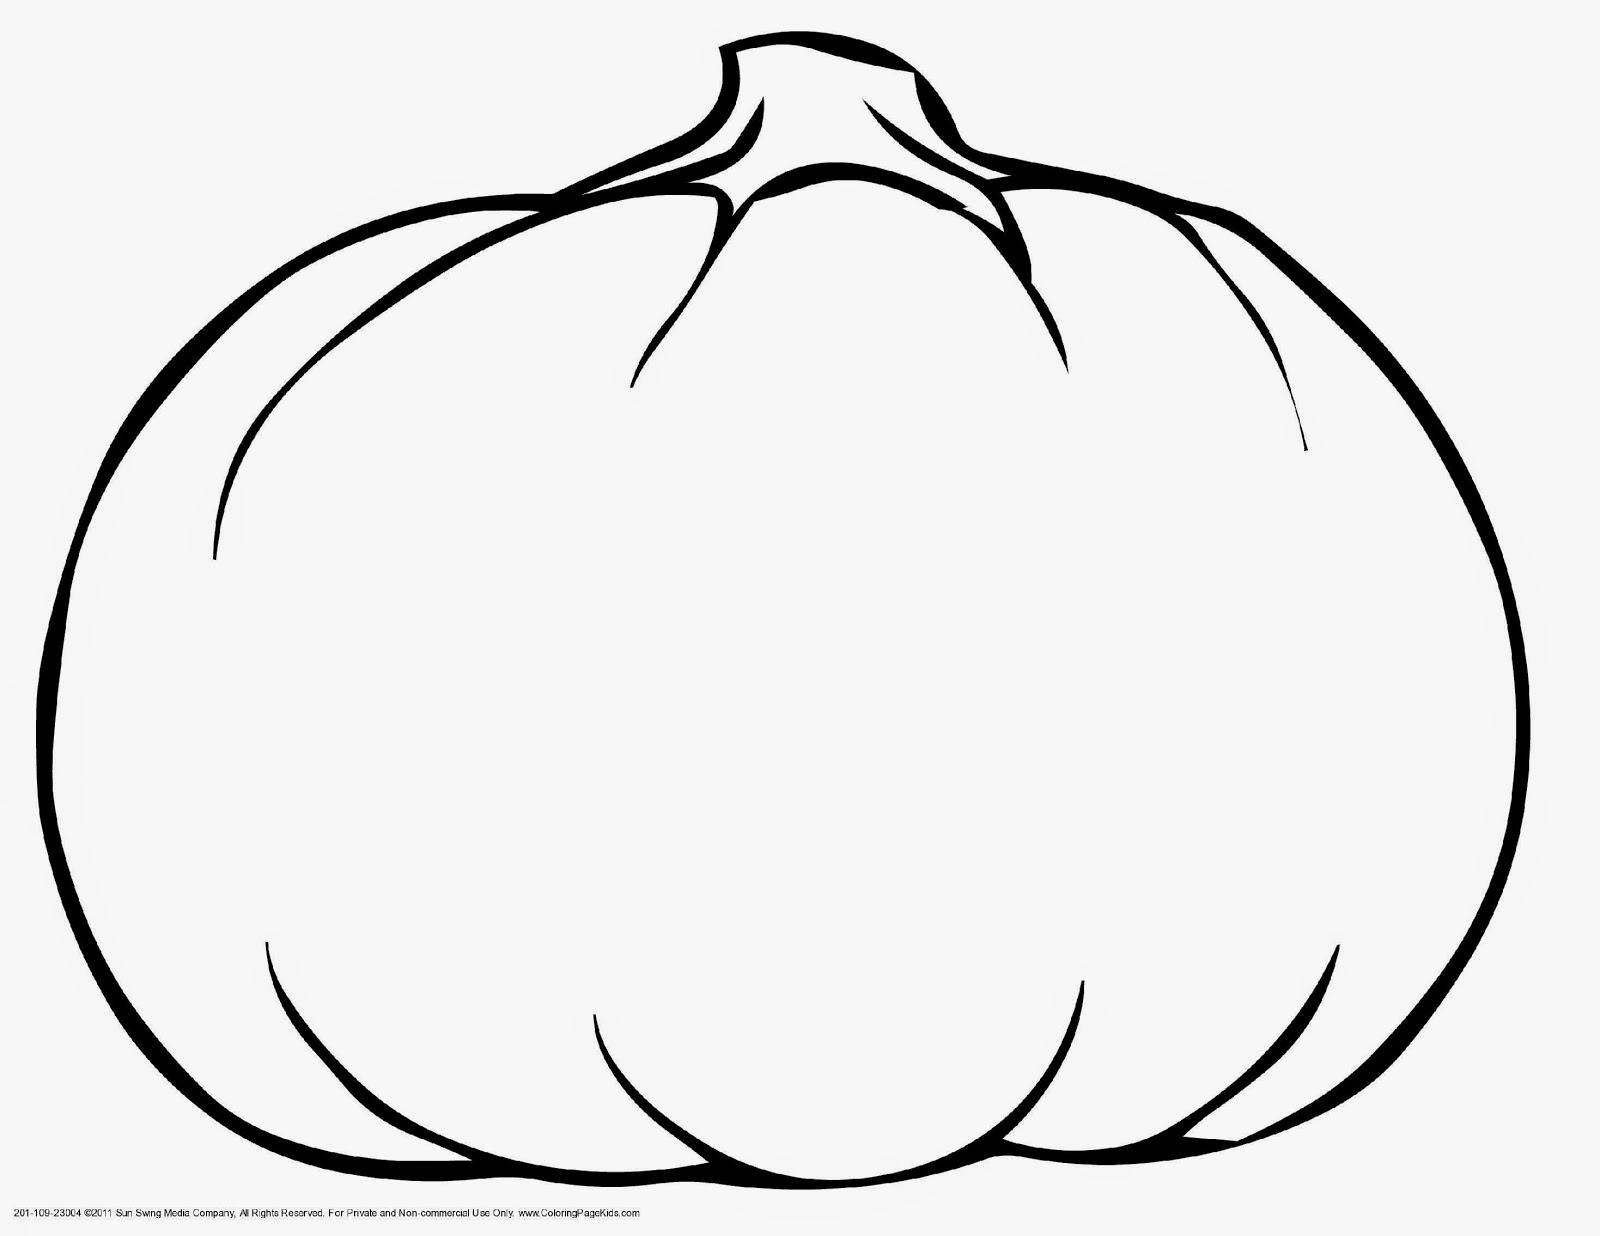 Pumpkin black and white smile - Pumpkin Clipart Black And White